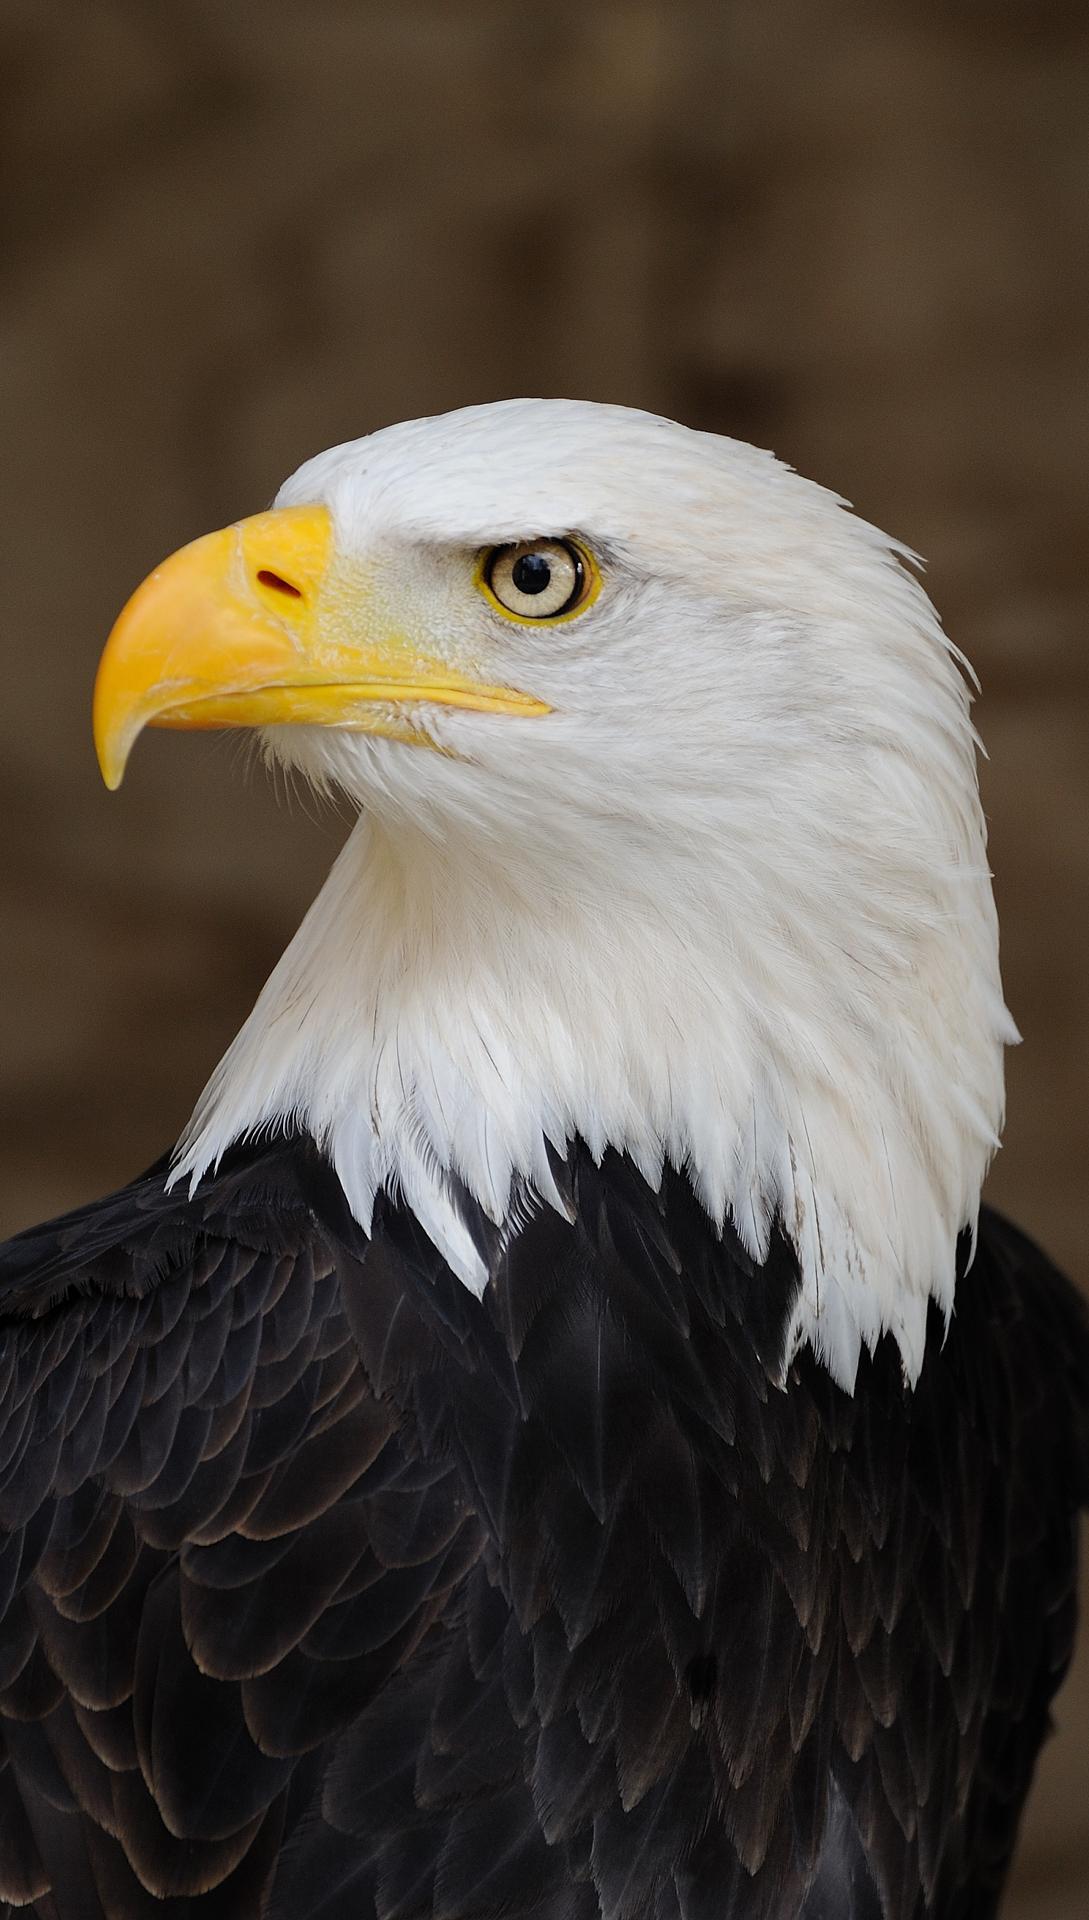 American Eagle Hd Wallpaper American eagle preview 1089x1920